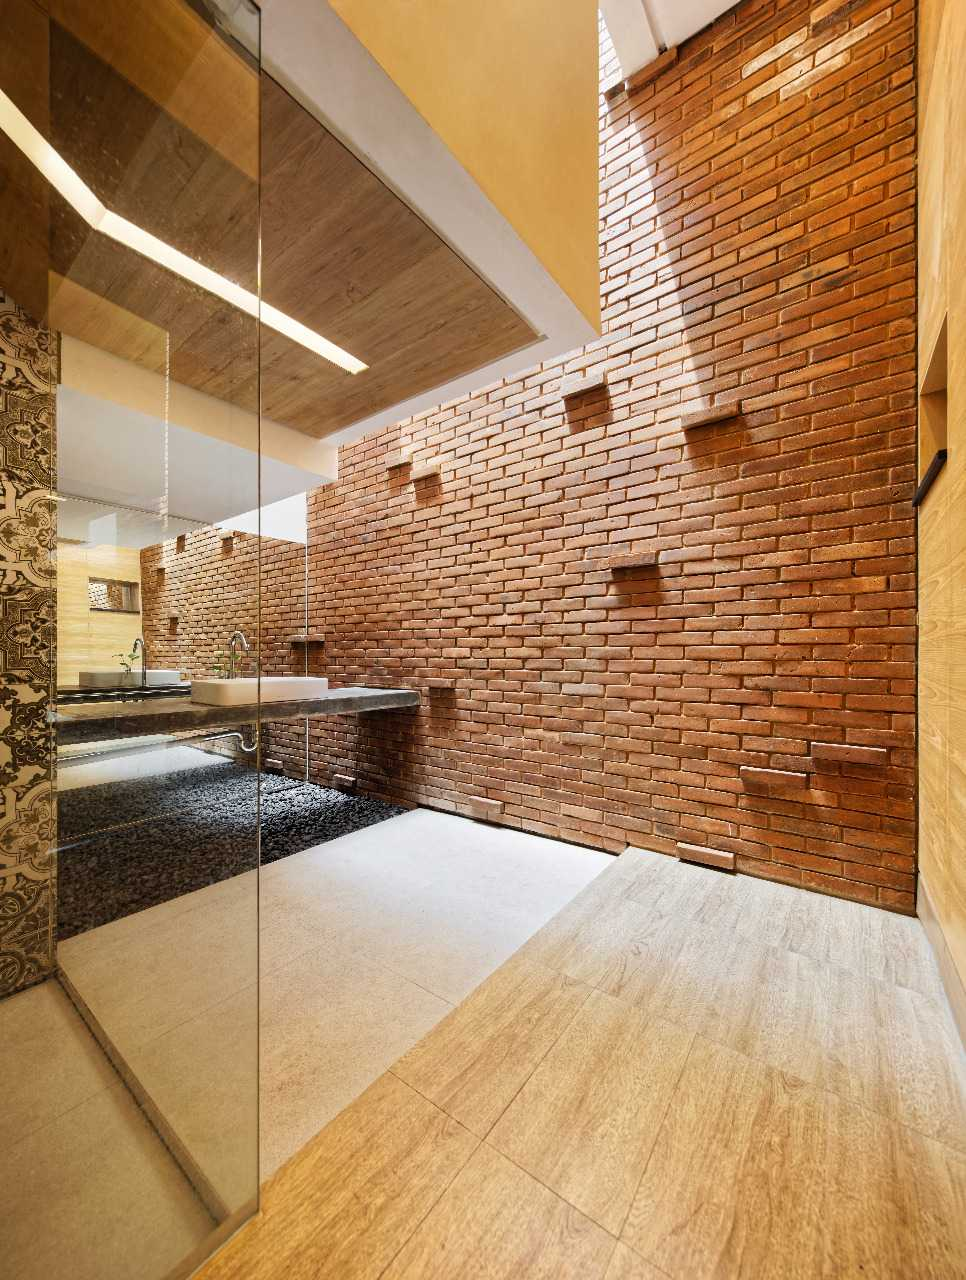 9.Kamar Mandi Rumah Minimalis Batu Bata